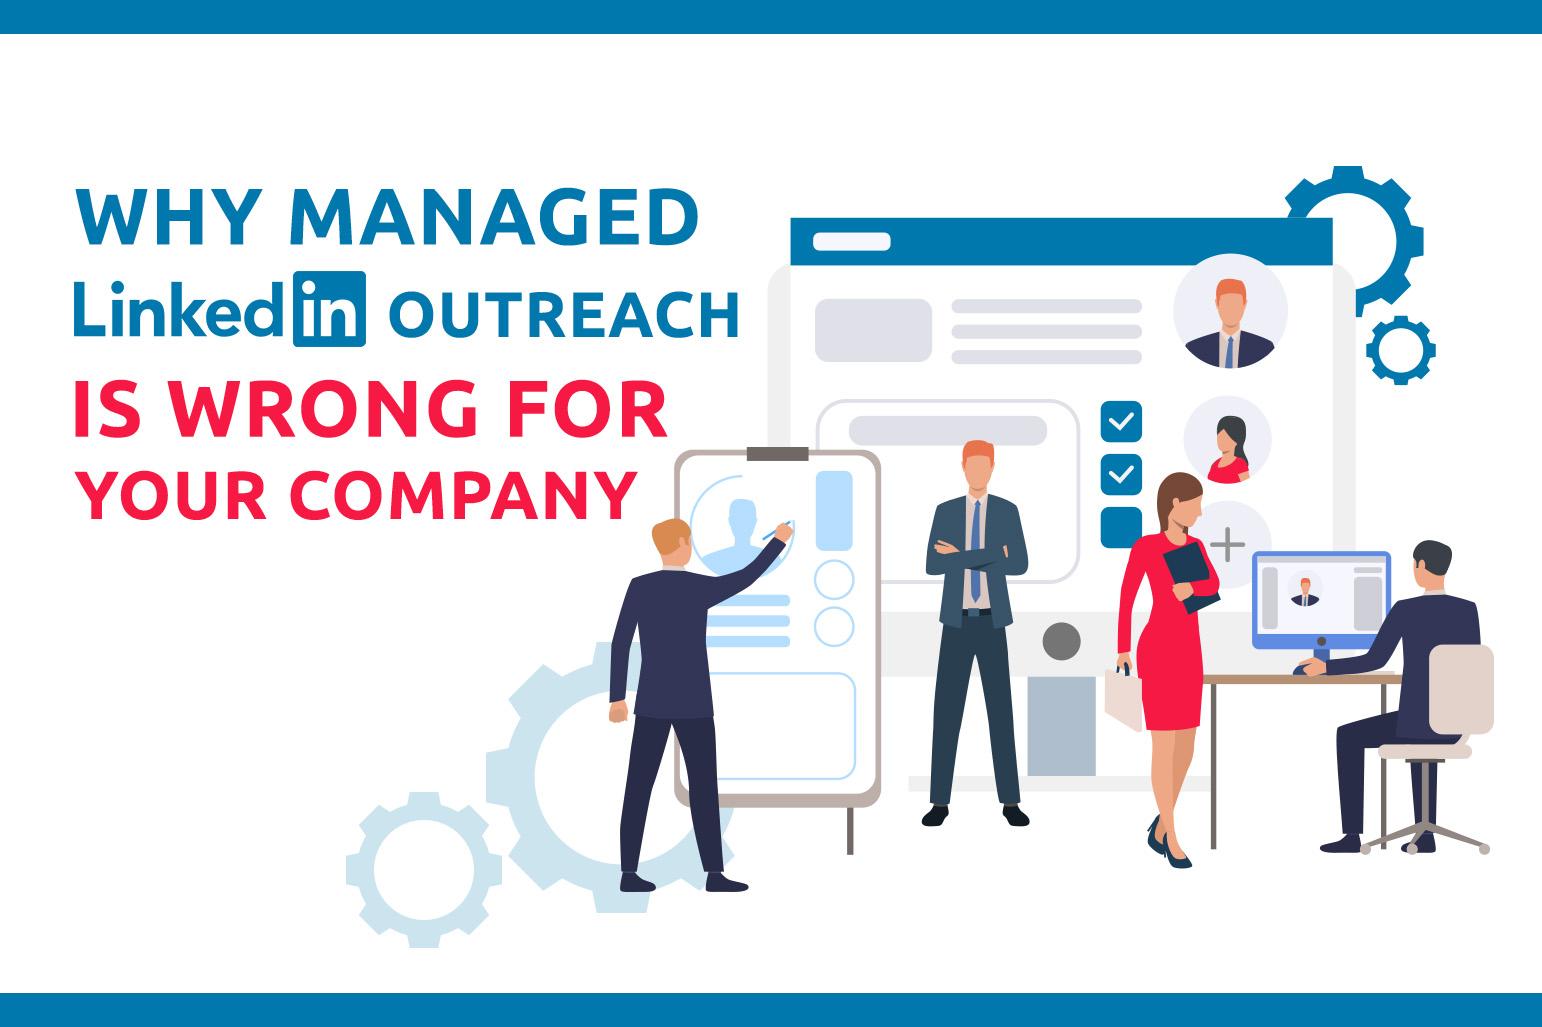 Perché la gestione di LinkedIn Outreach è sbagliata per la vostra azienda